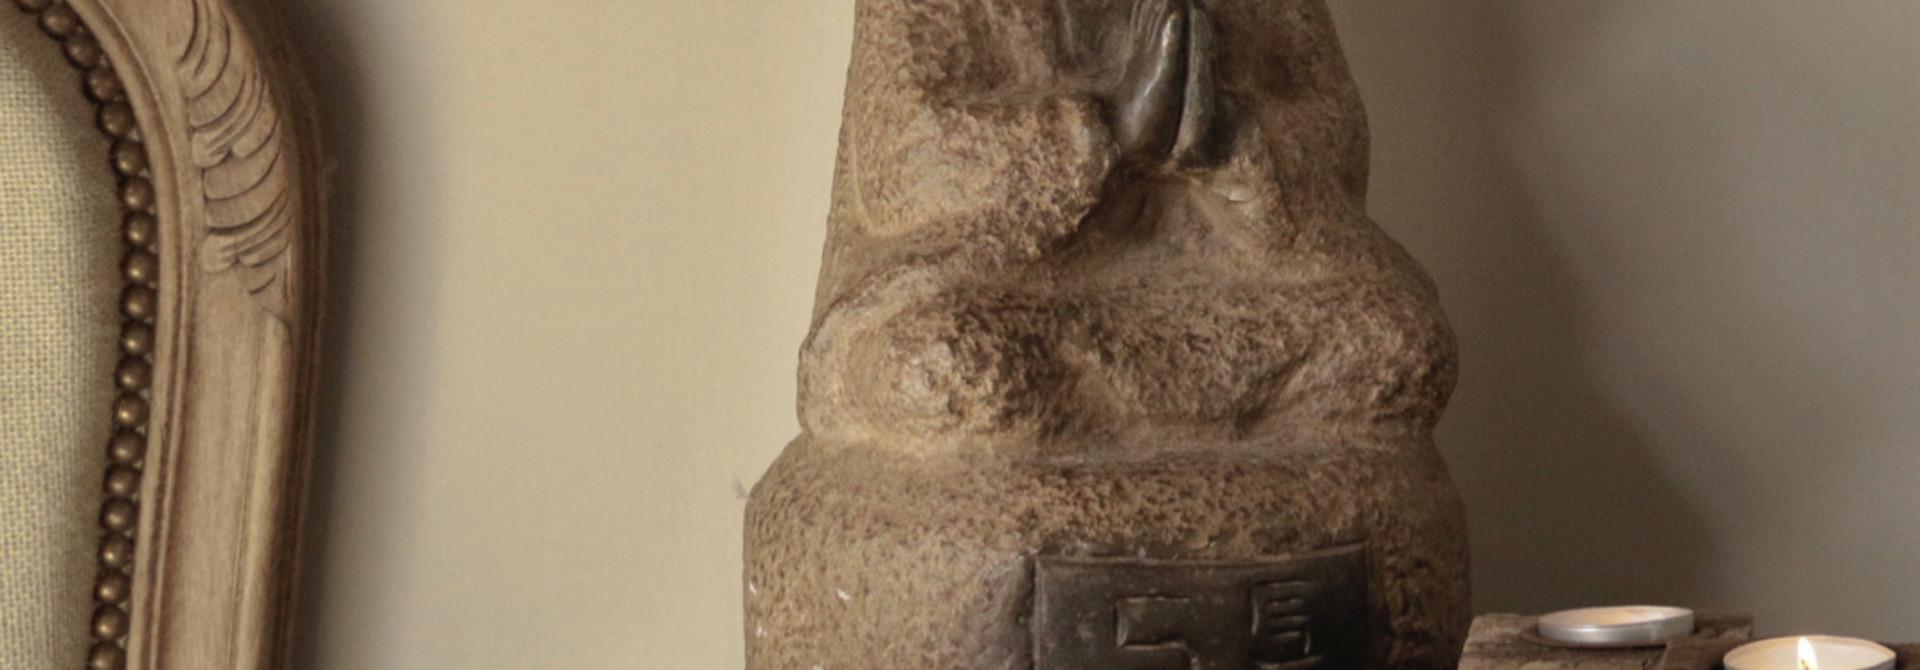 Handmade Stone Monk